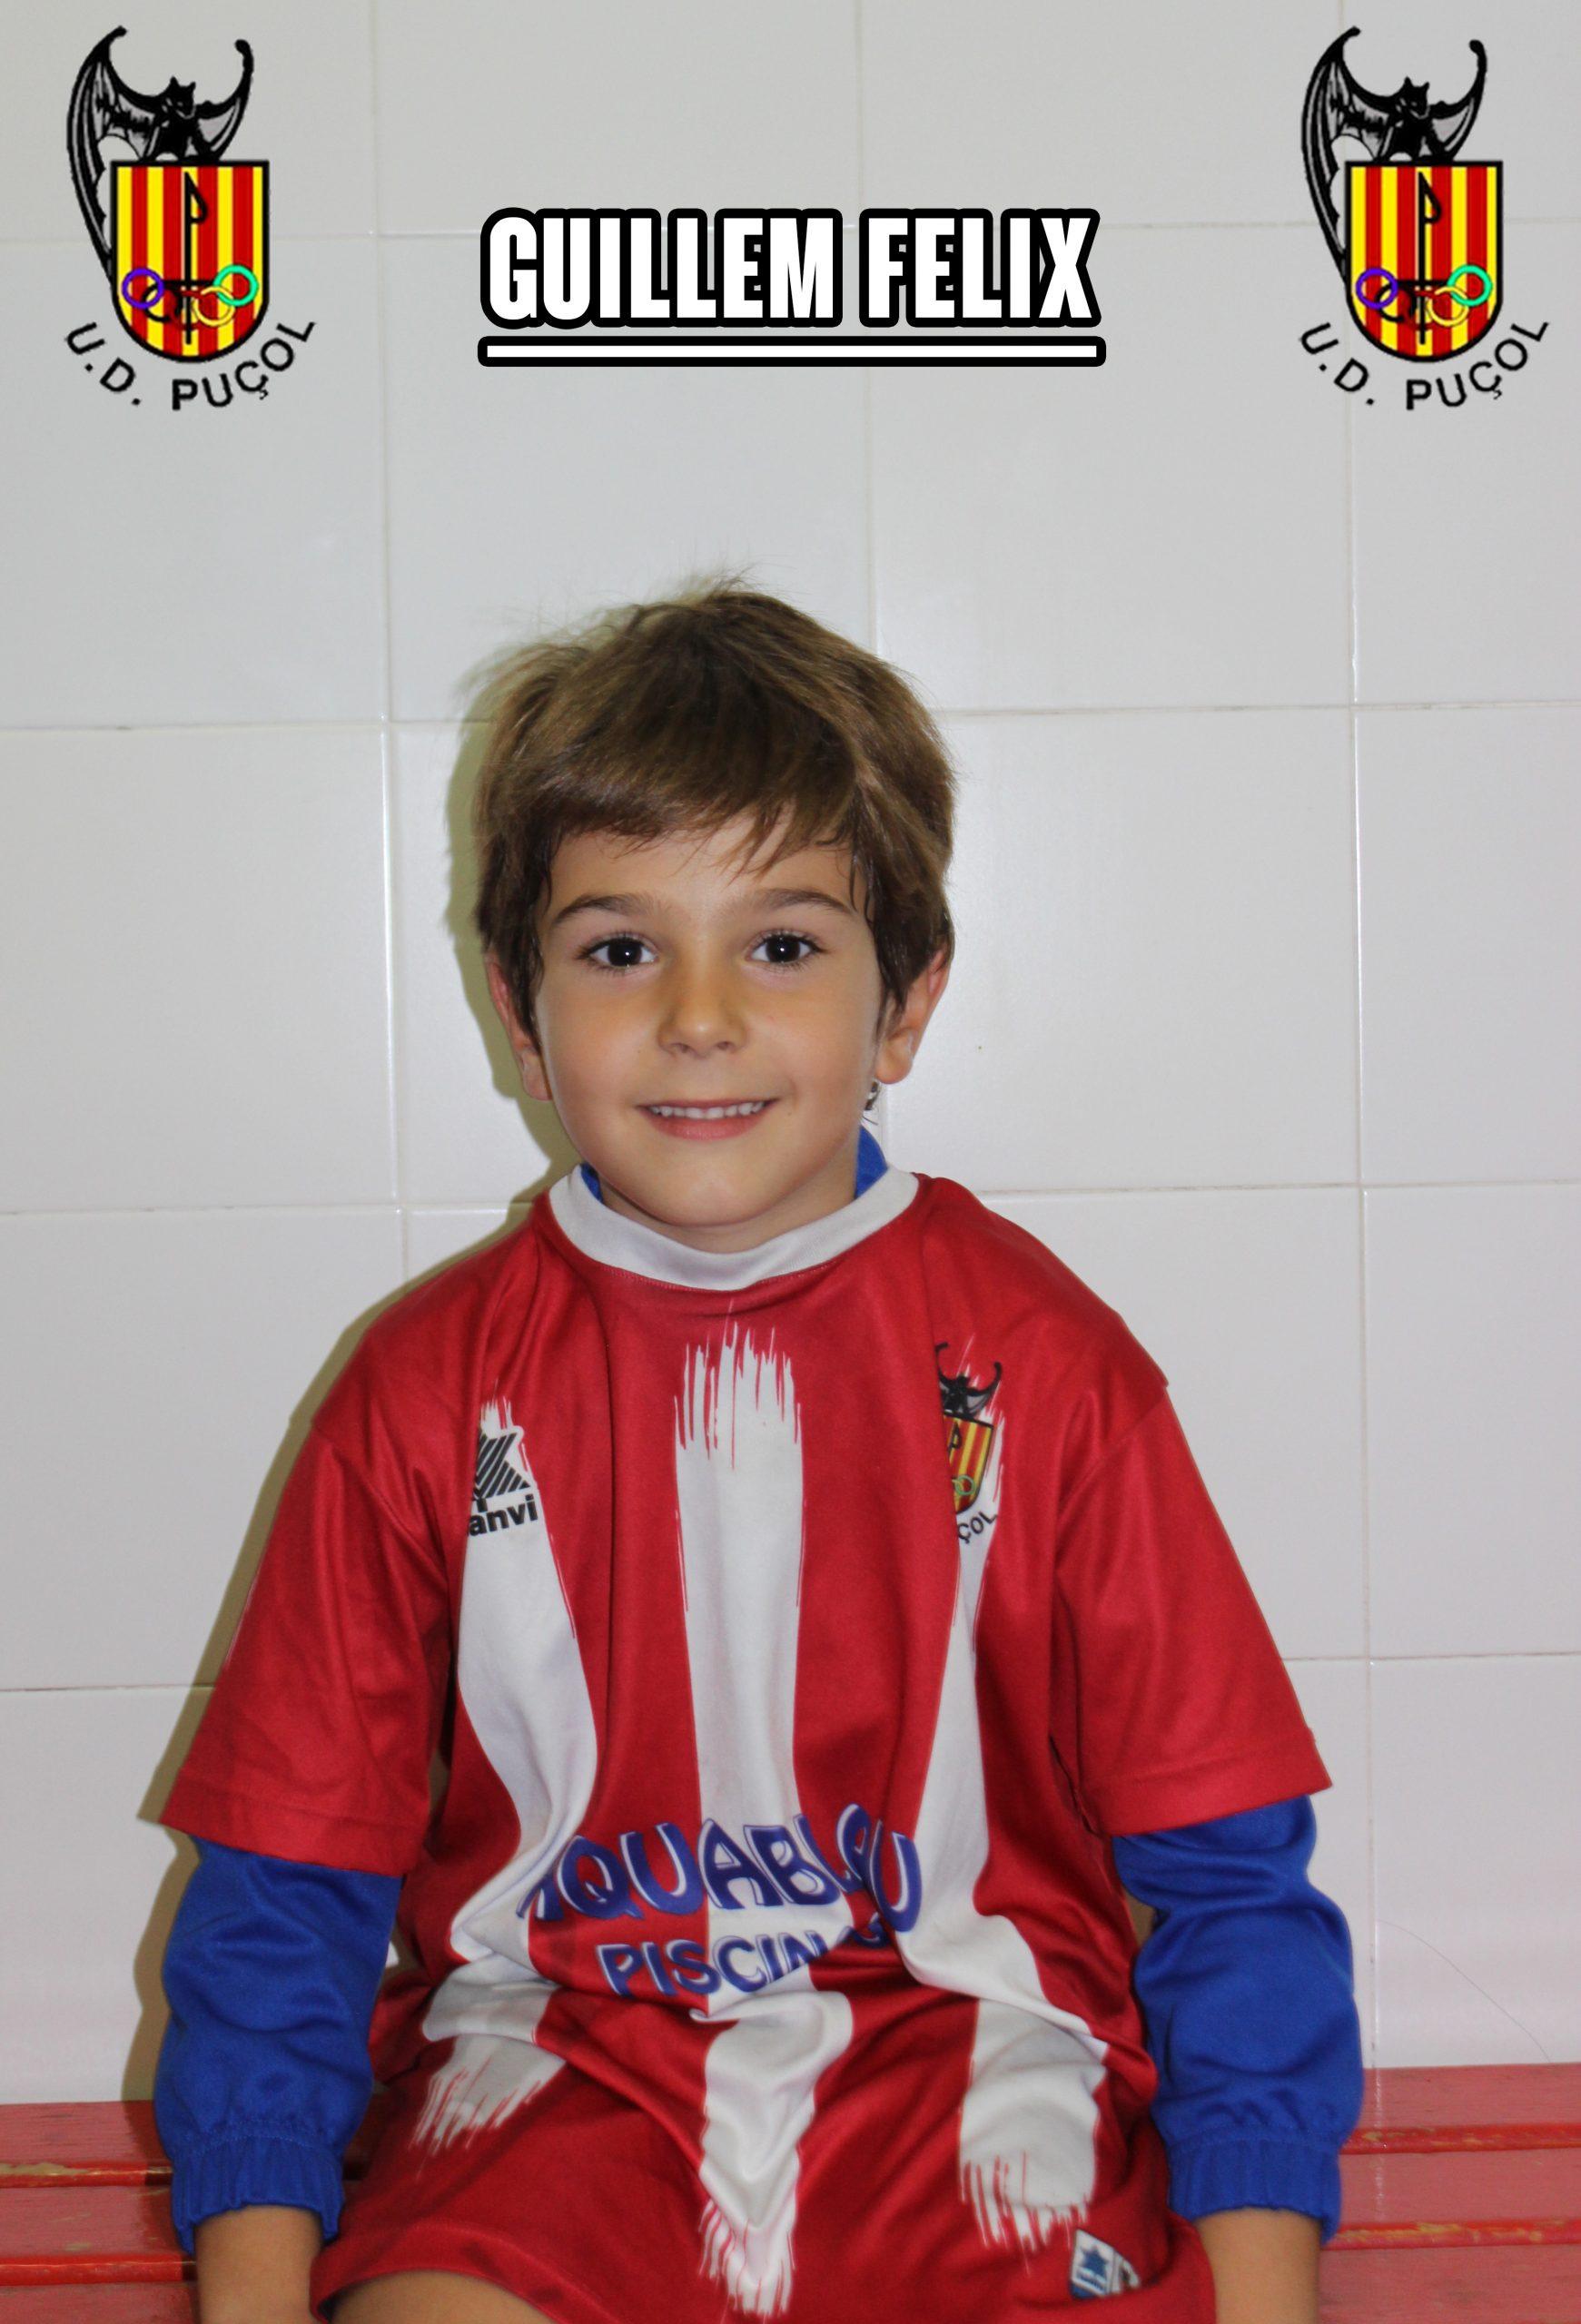 Guillem Felix